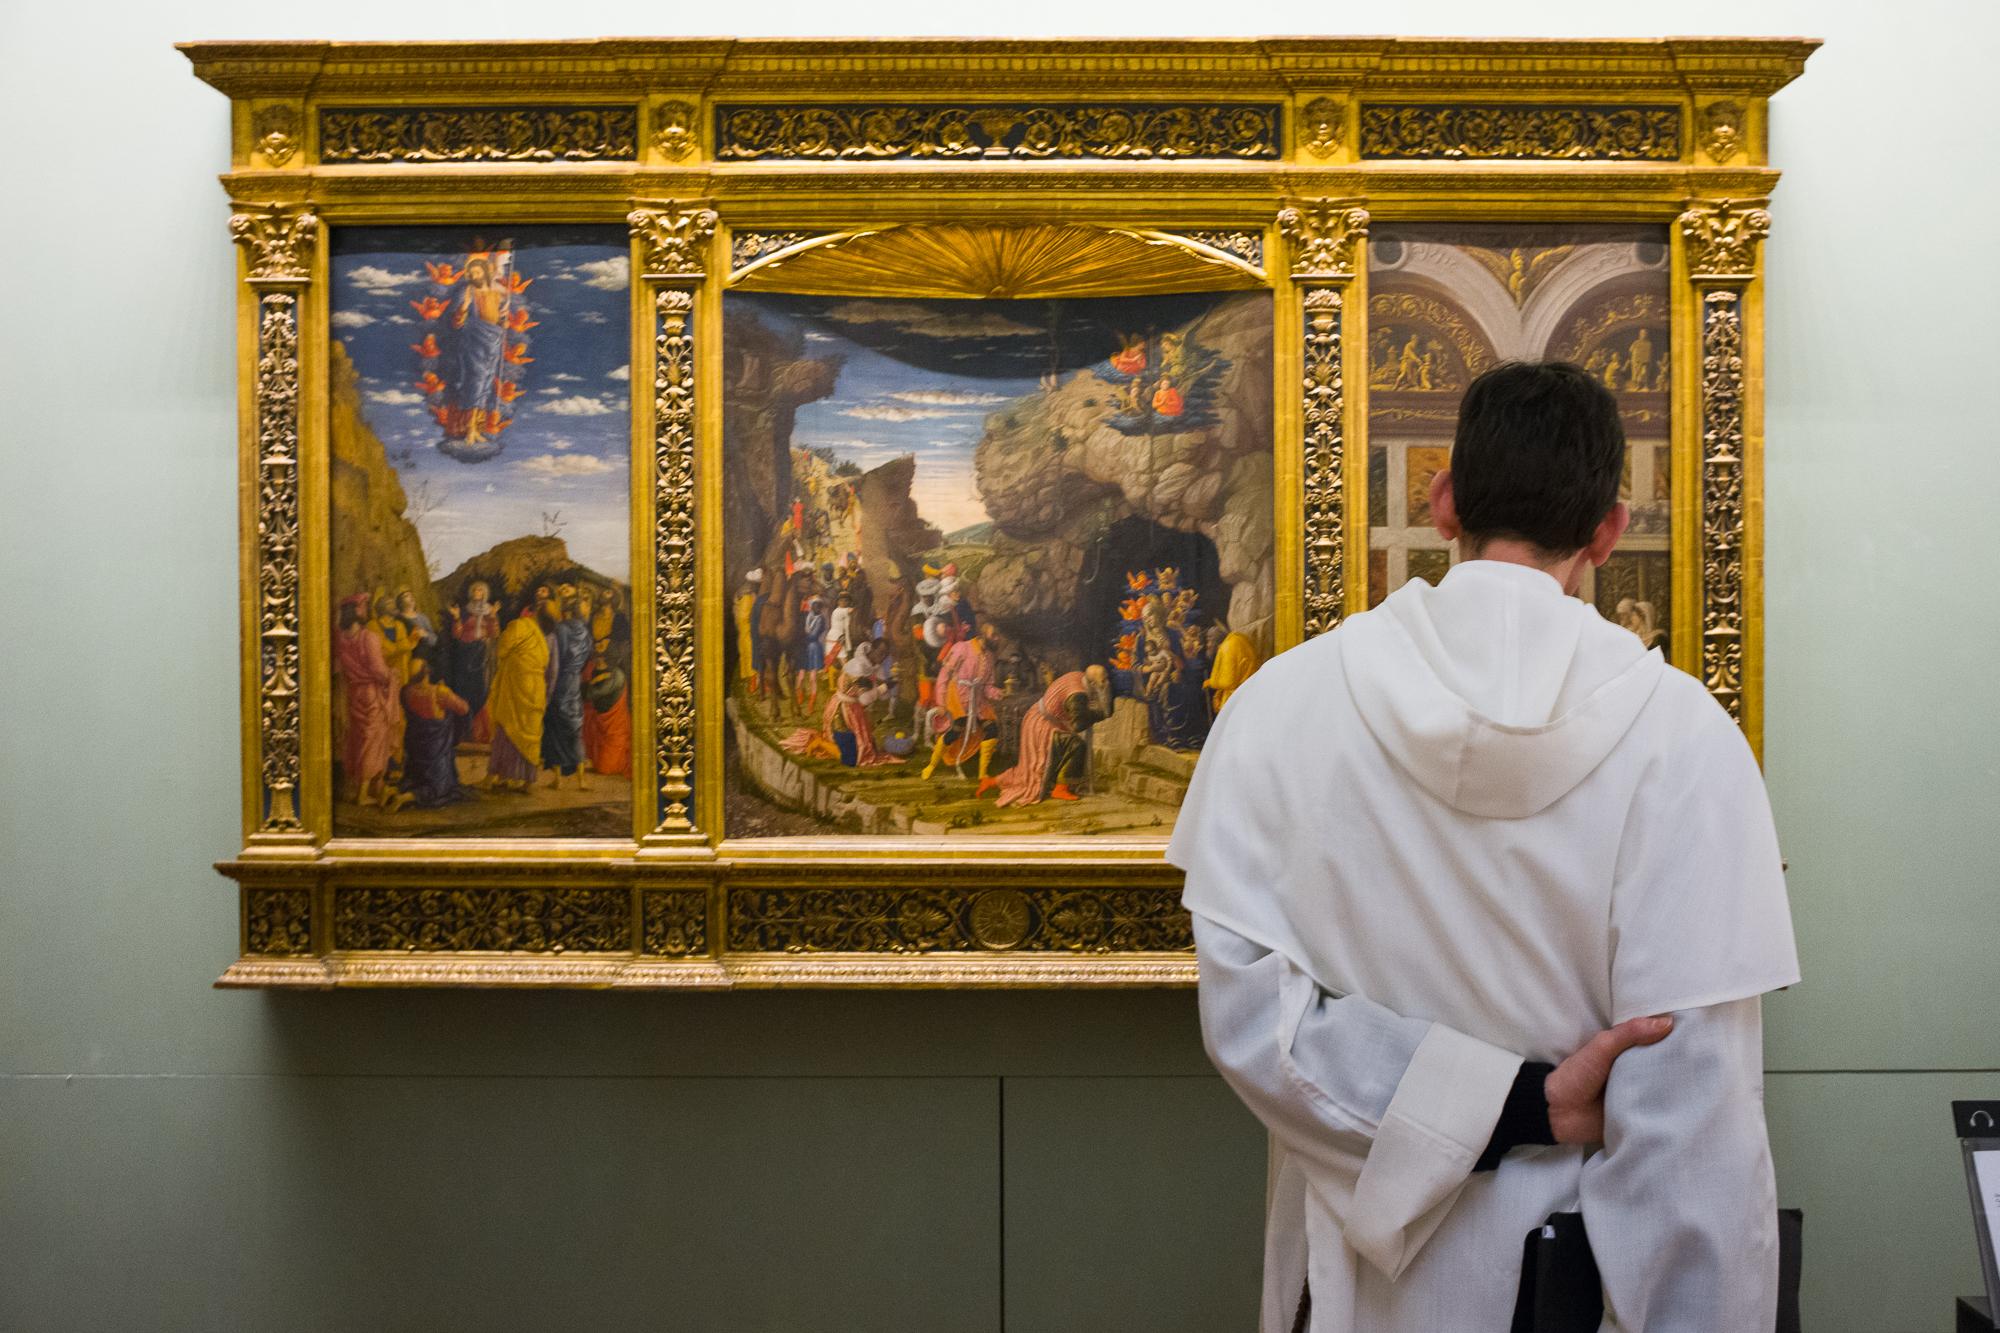 A priest enjoying sacred art at The Uffizi